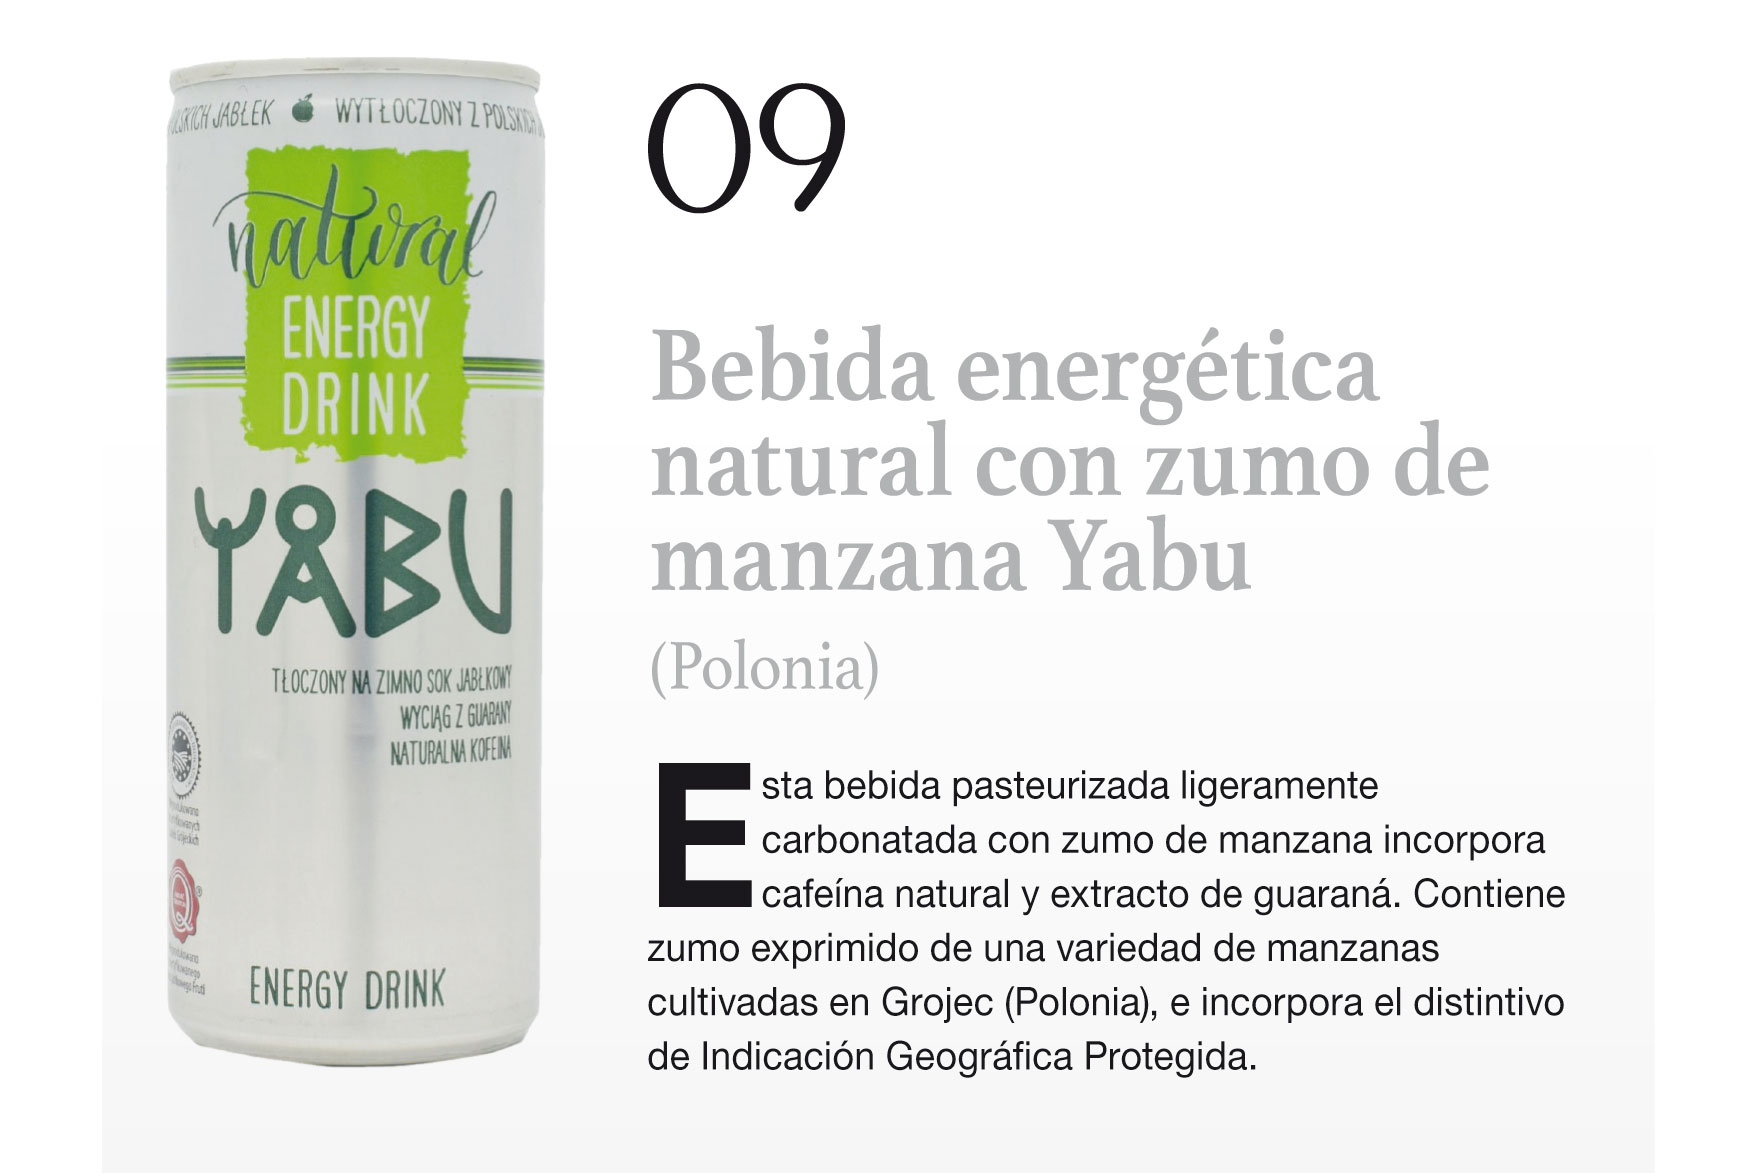 Bebida energética natural con zumo de manzana Yabu (Polonia)